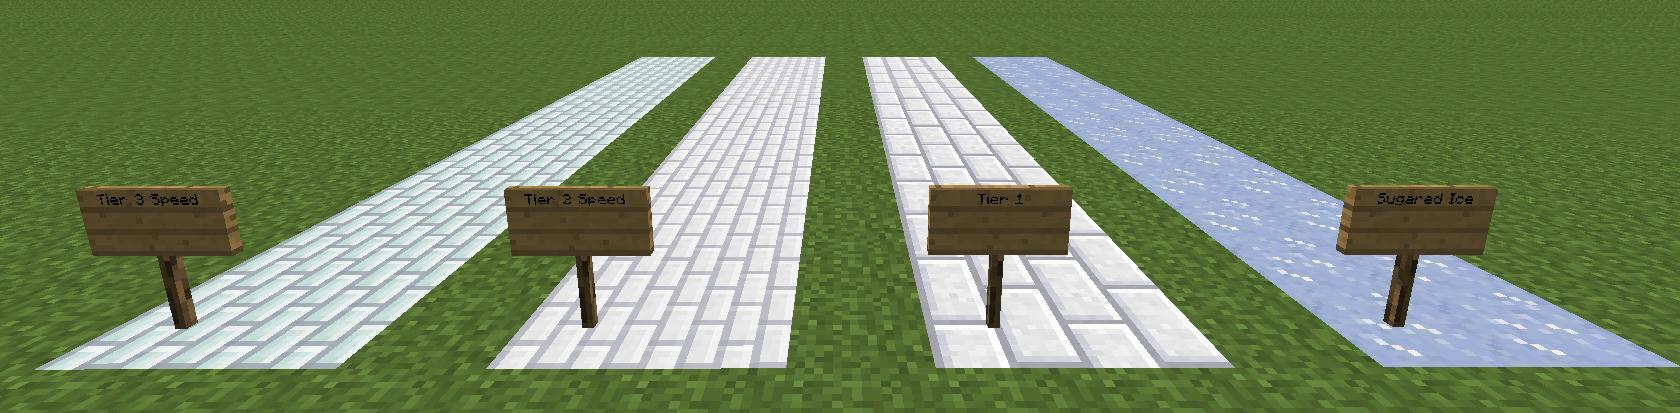 Sugar-Infused-Blocks-Mod-1.png